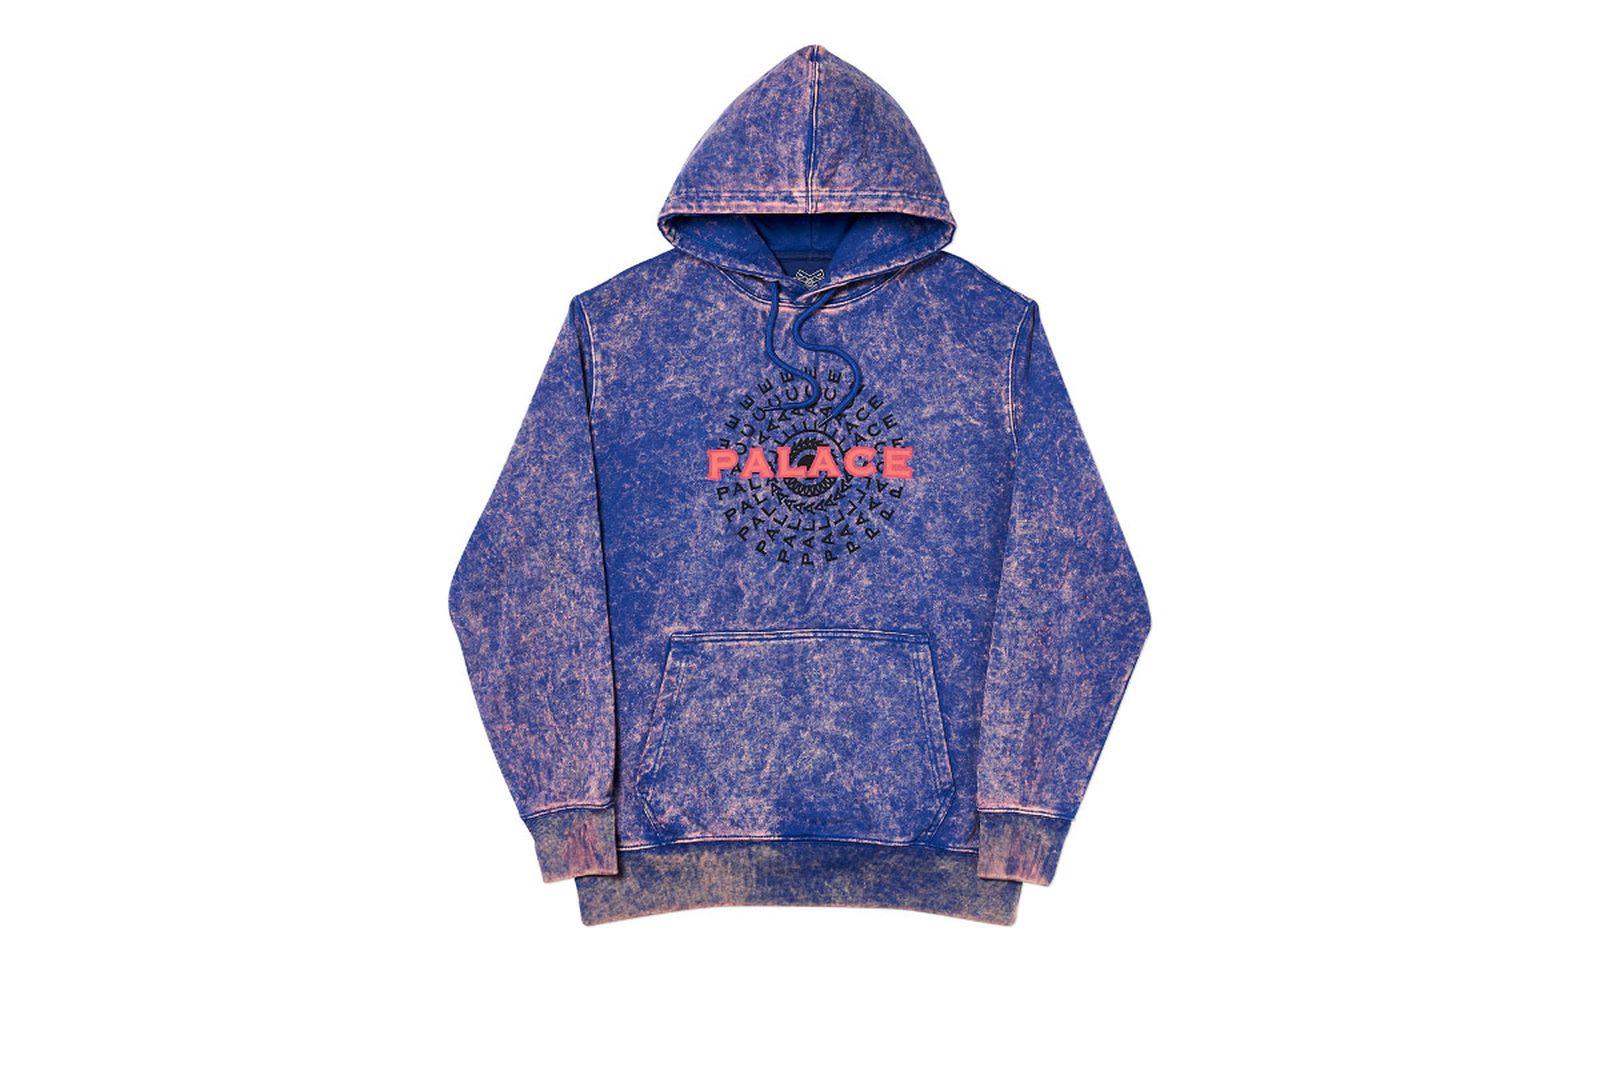 Palace 2019 Autumn Hood Piricle Acid Wash Blue Front